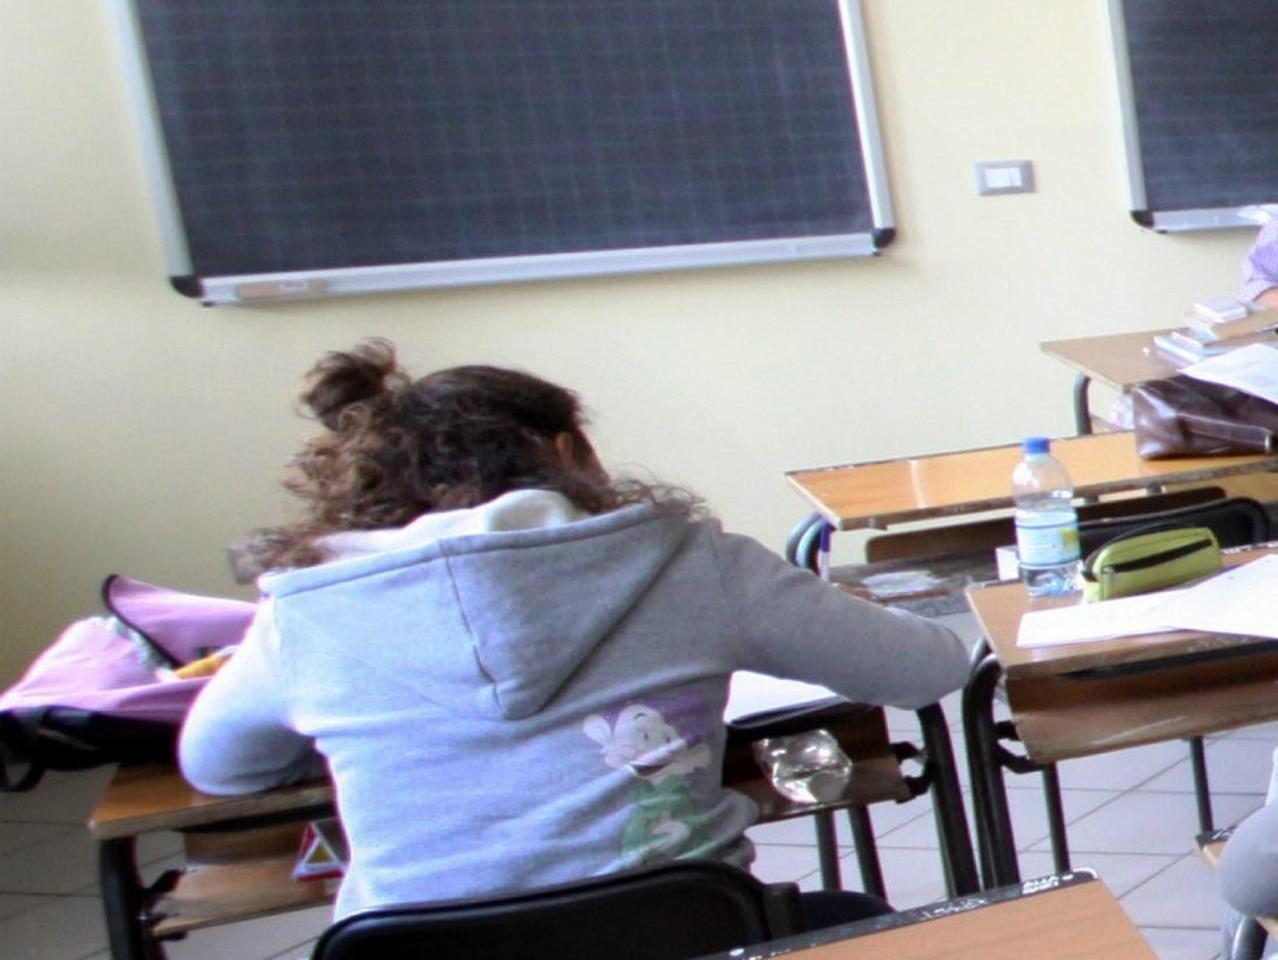 Danimarca, classi divise per etnie in un liceo: è polemica